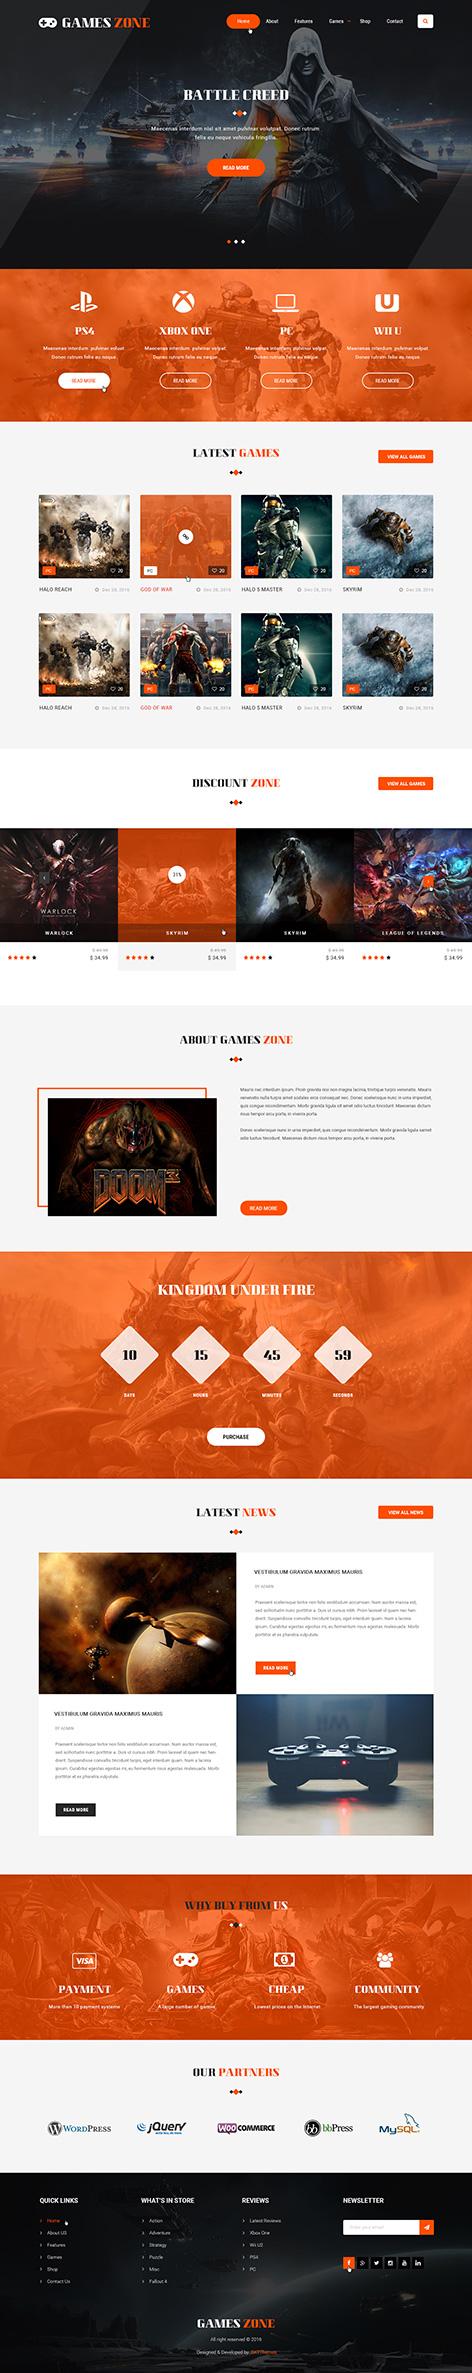 game developer WordPress theme